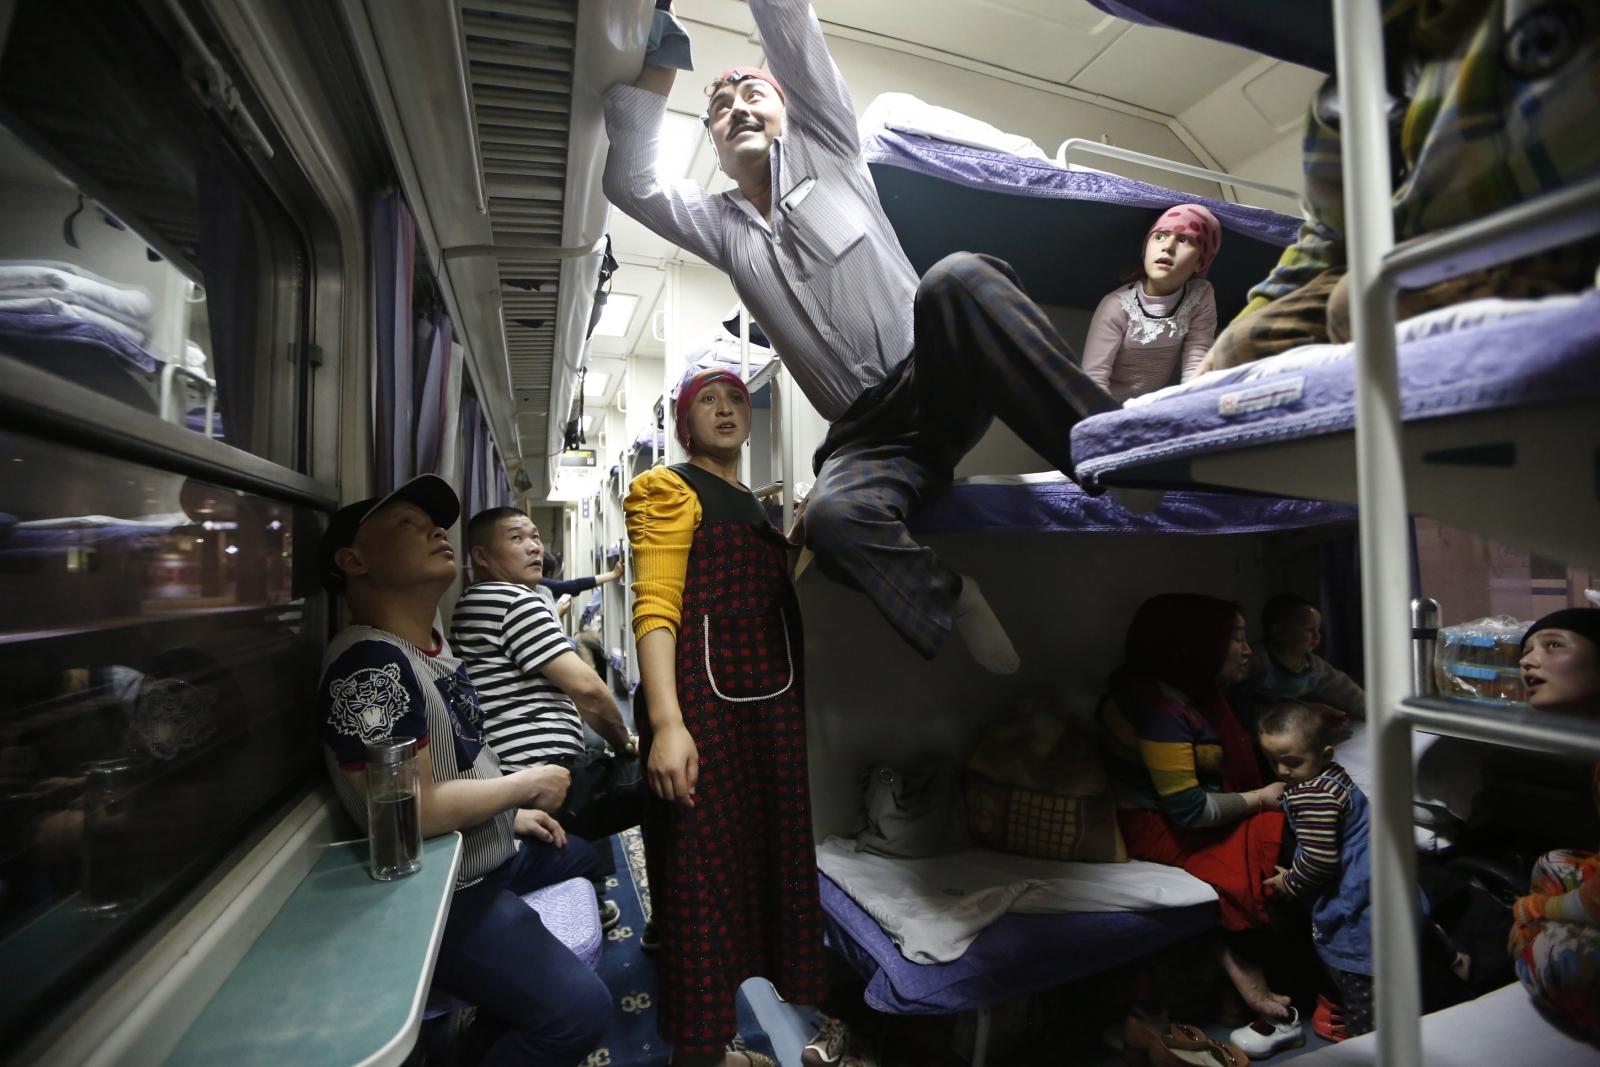 China Bans Islamic Dress, Beards and Headscarves in Xinjiang Public Transport